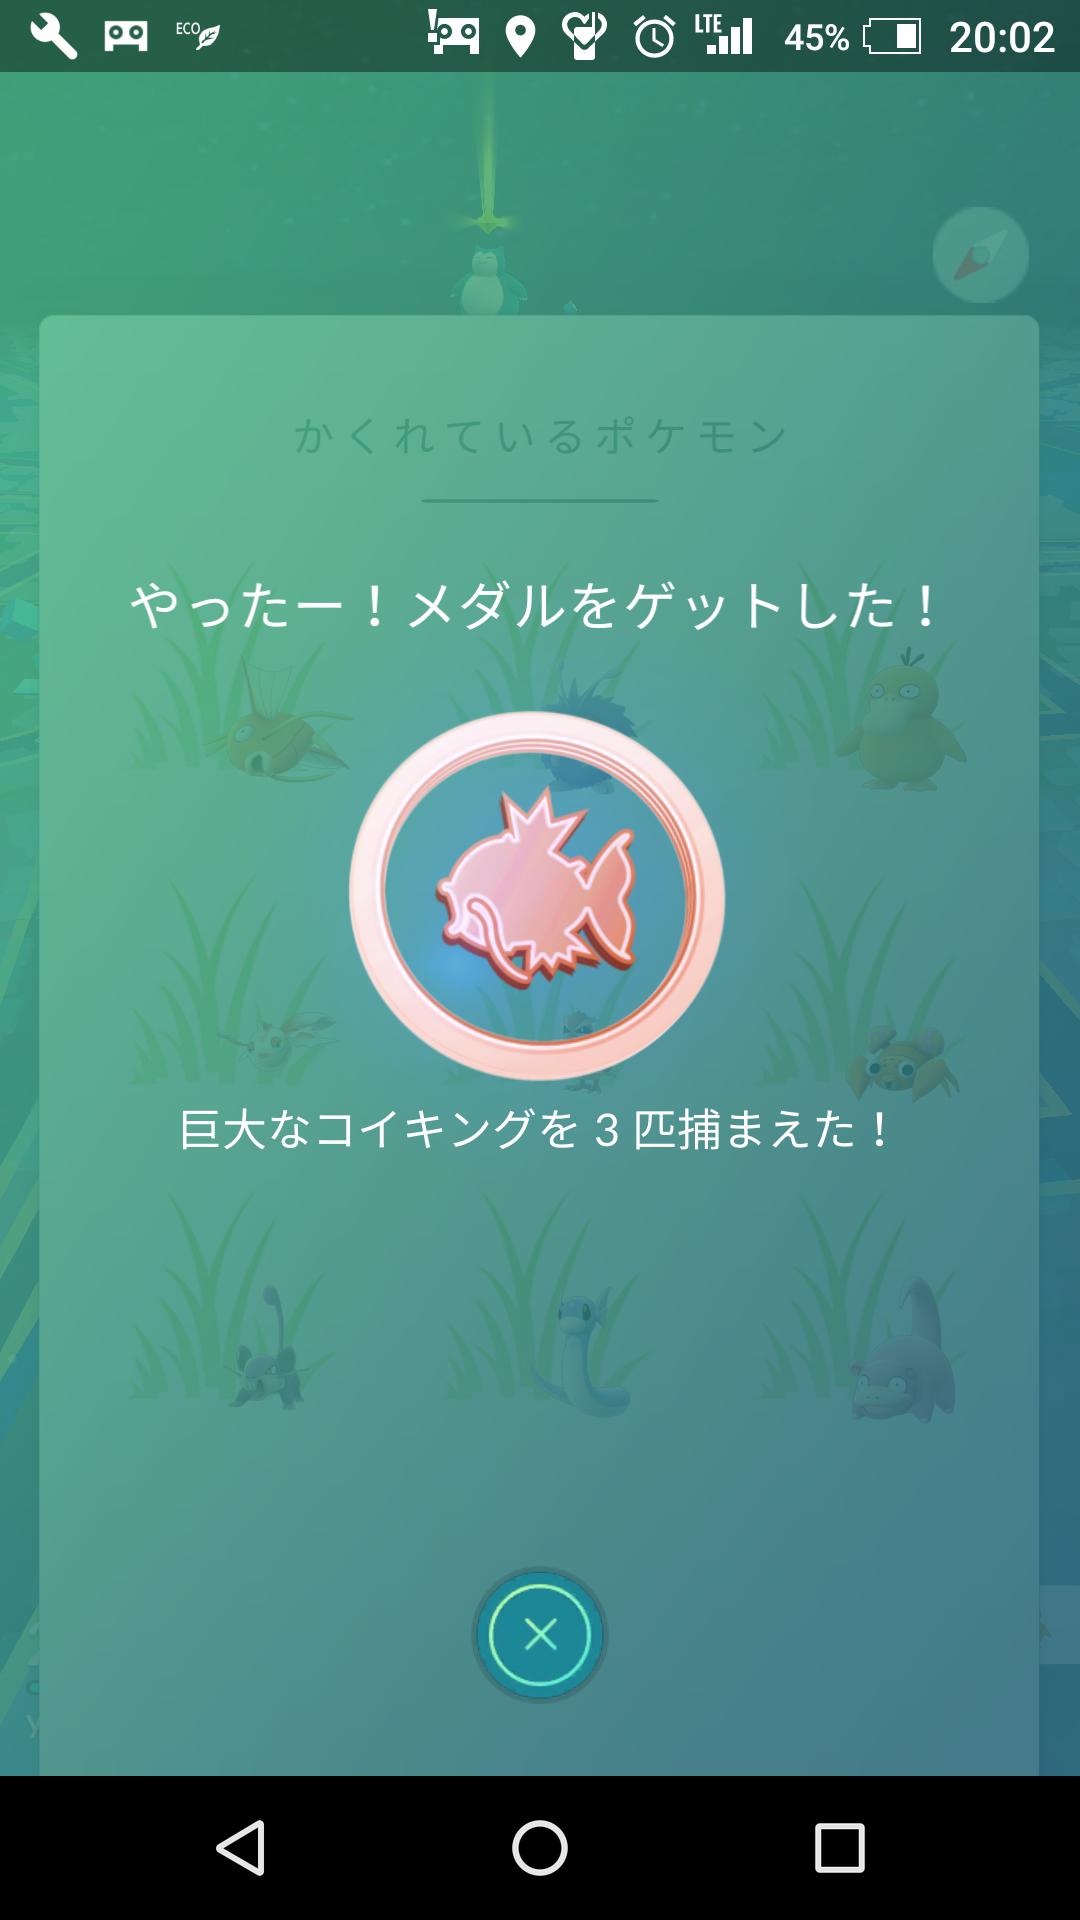 Screenshot_20170120-200233.png